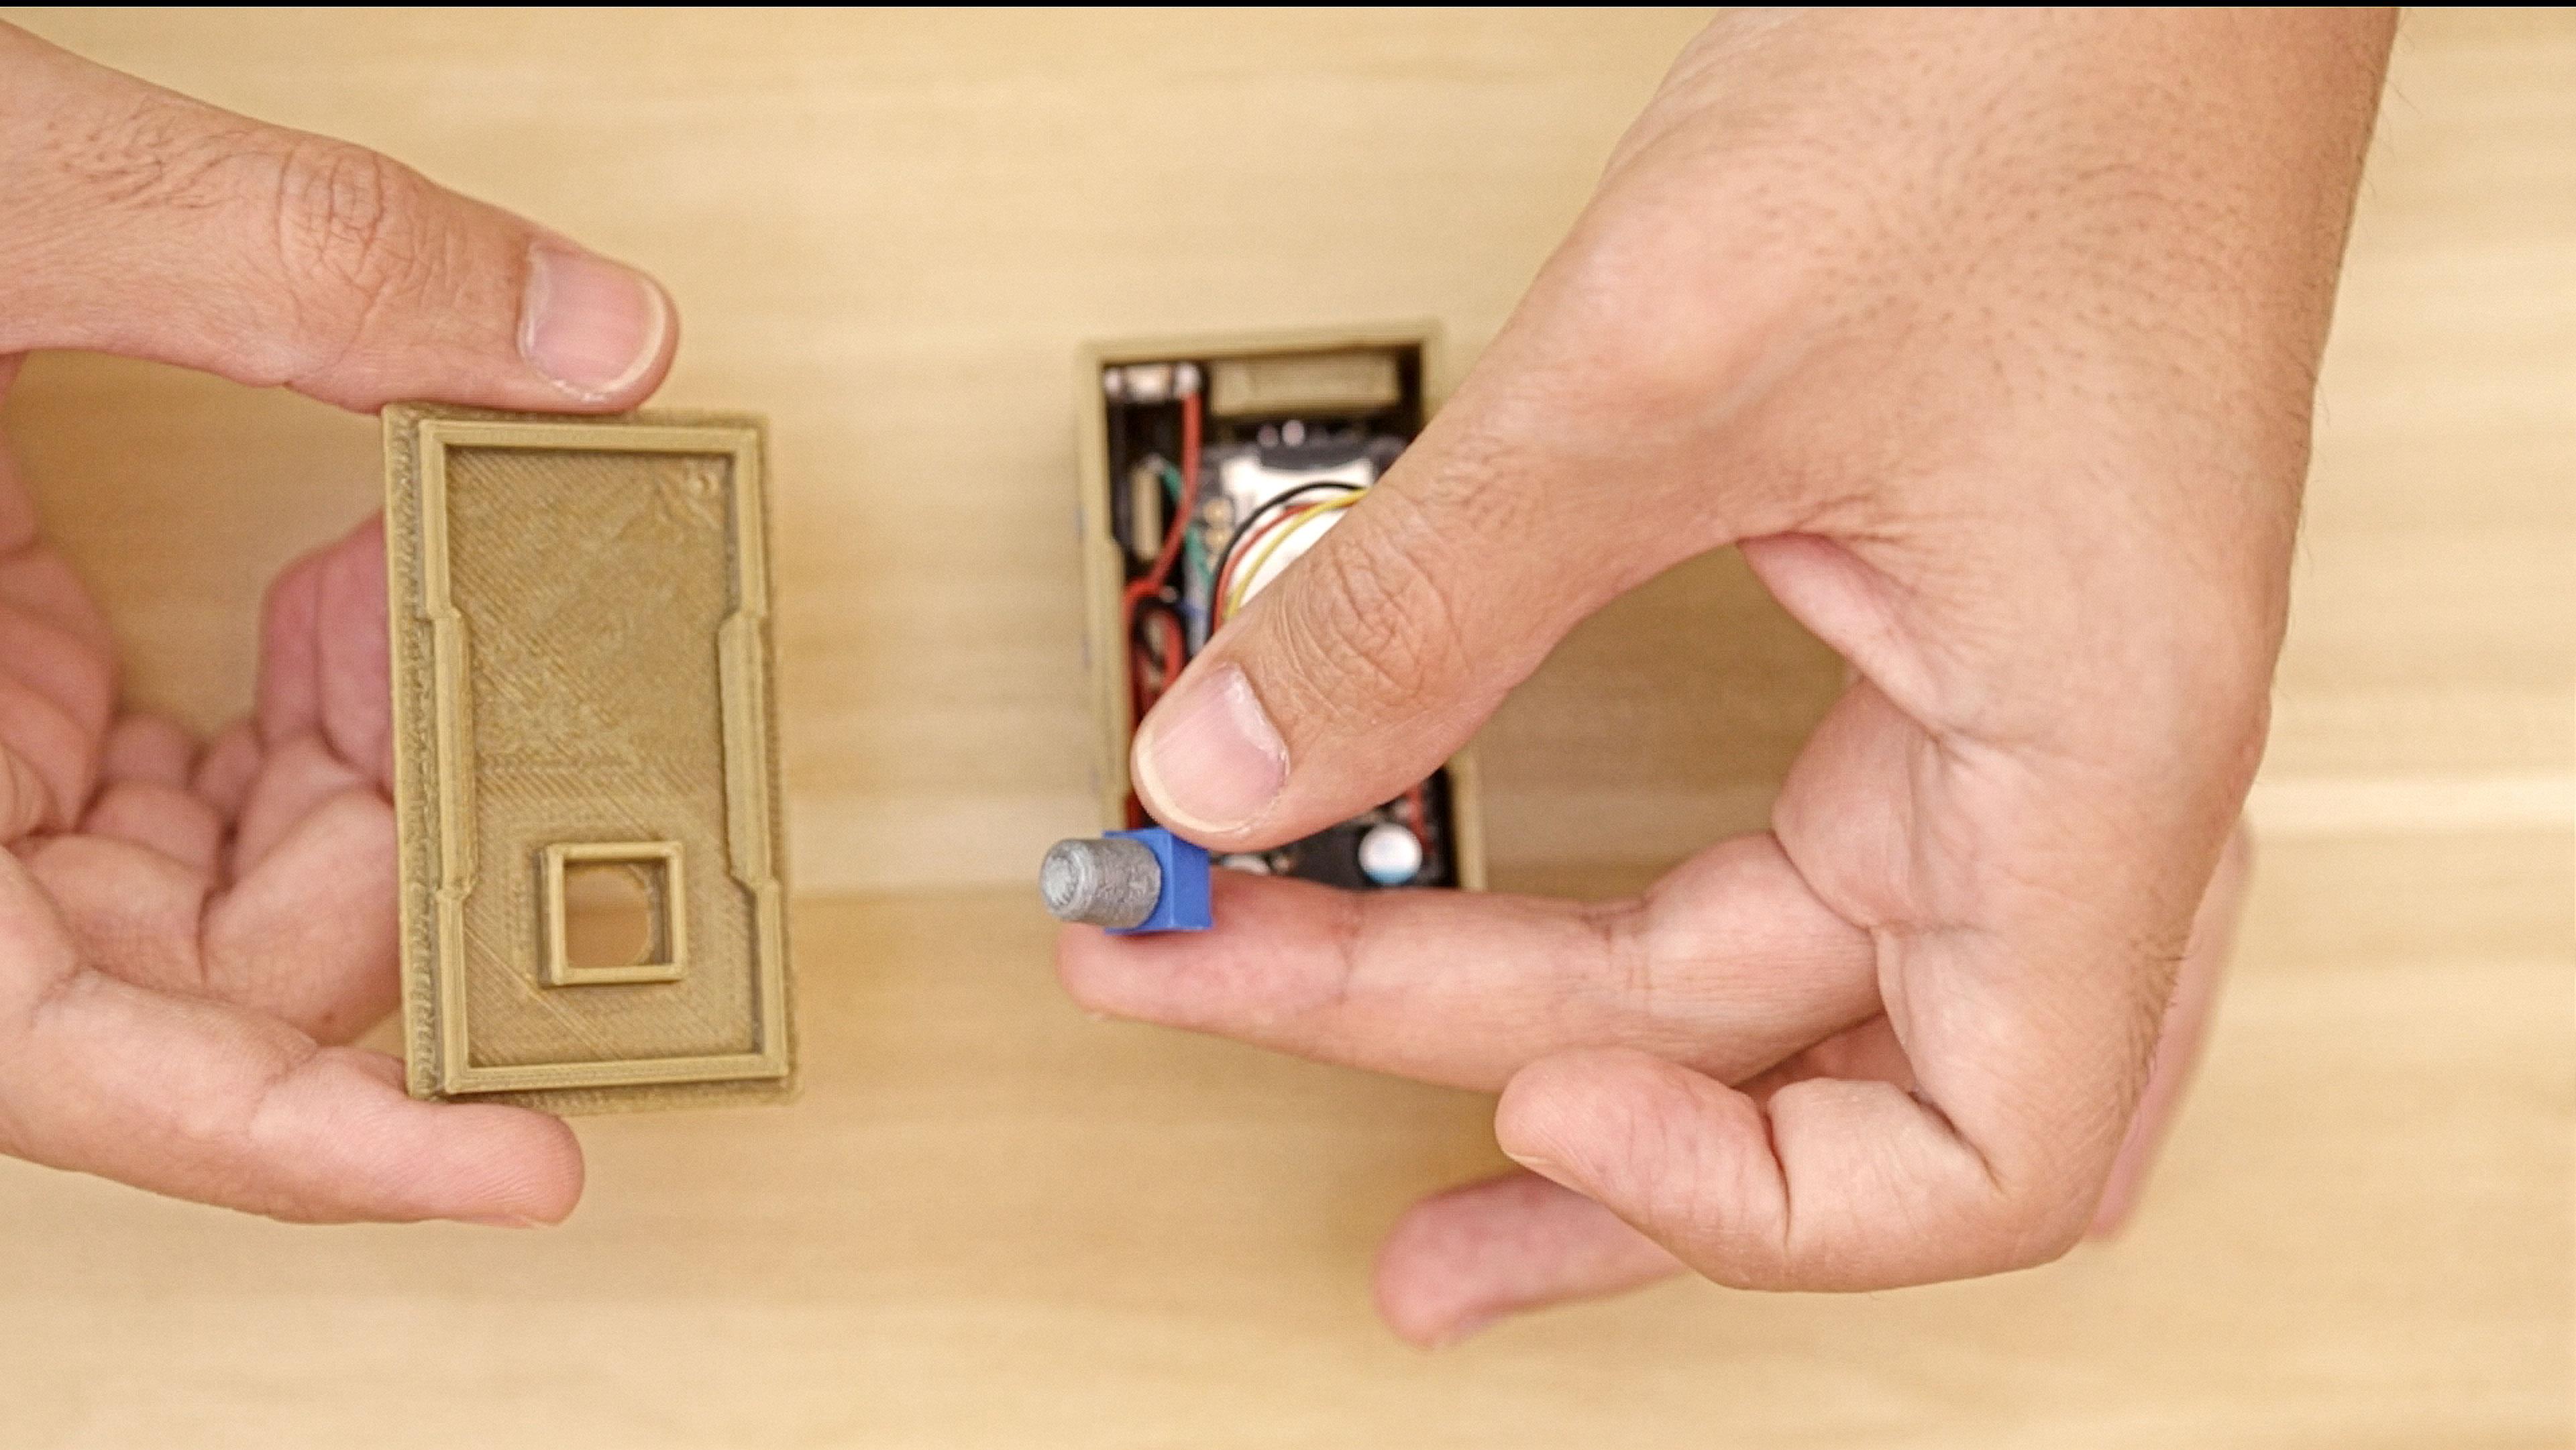 3d_printing_knob-lid-align.jpg